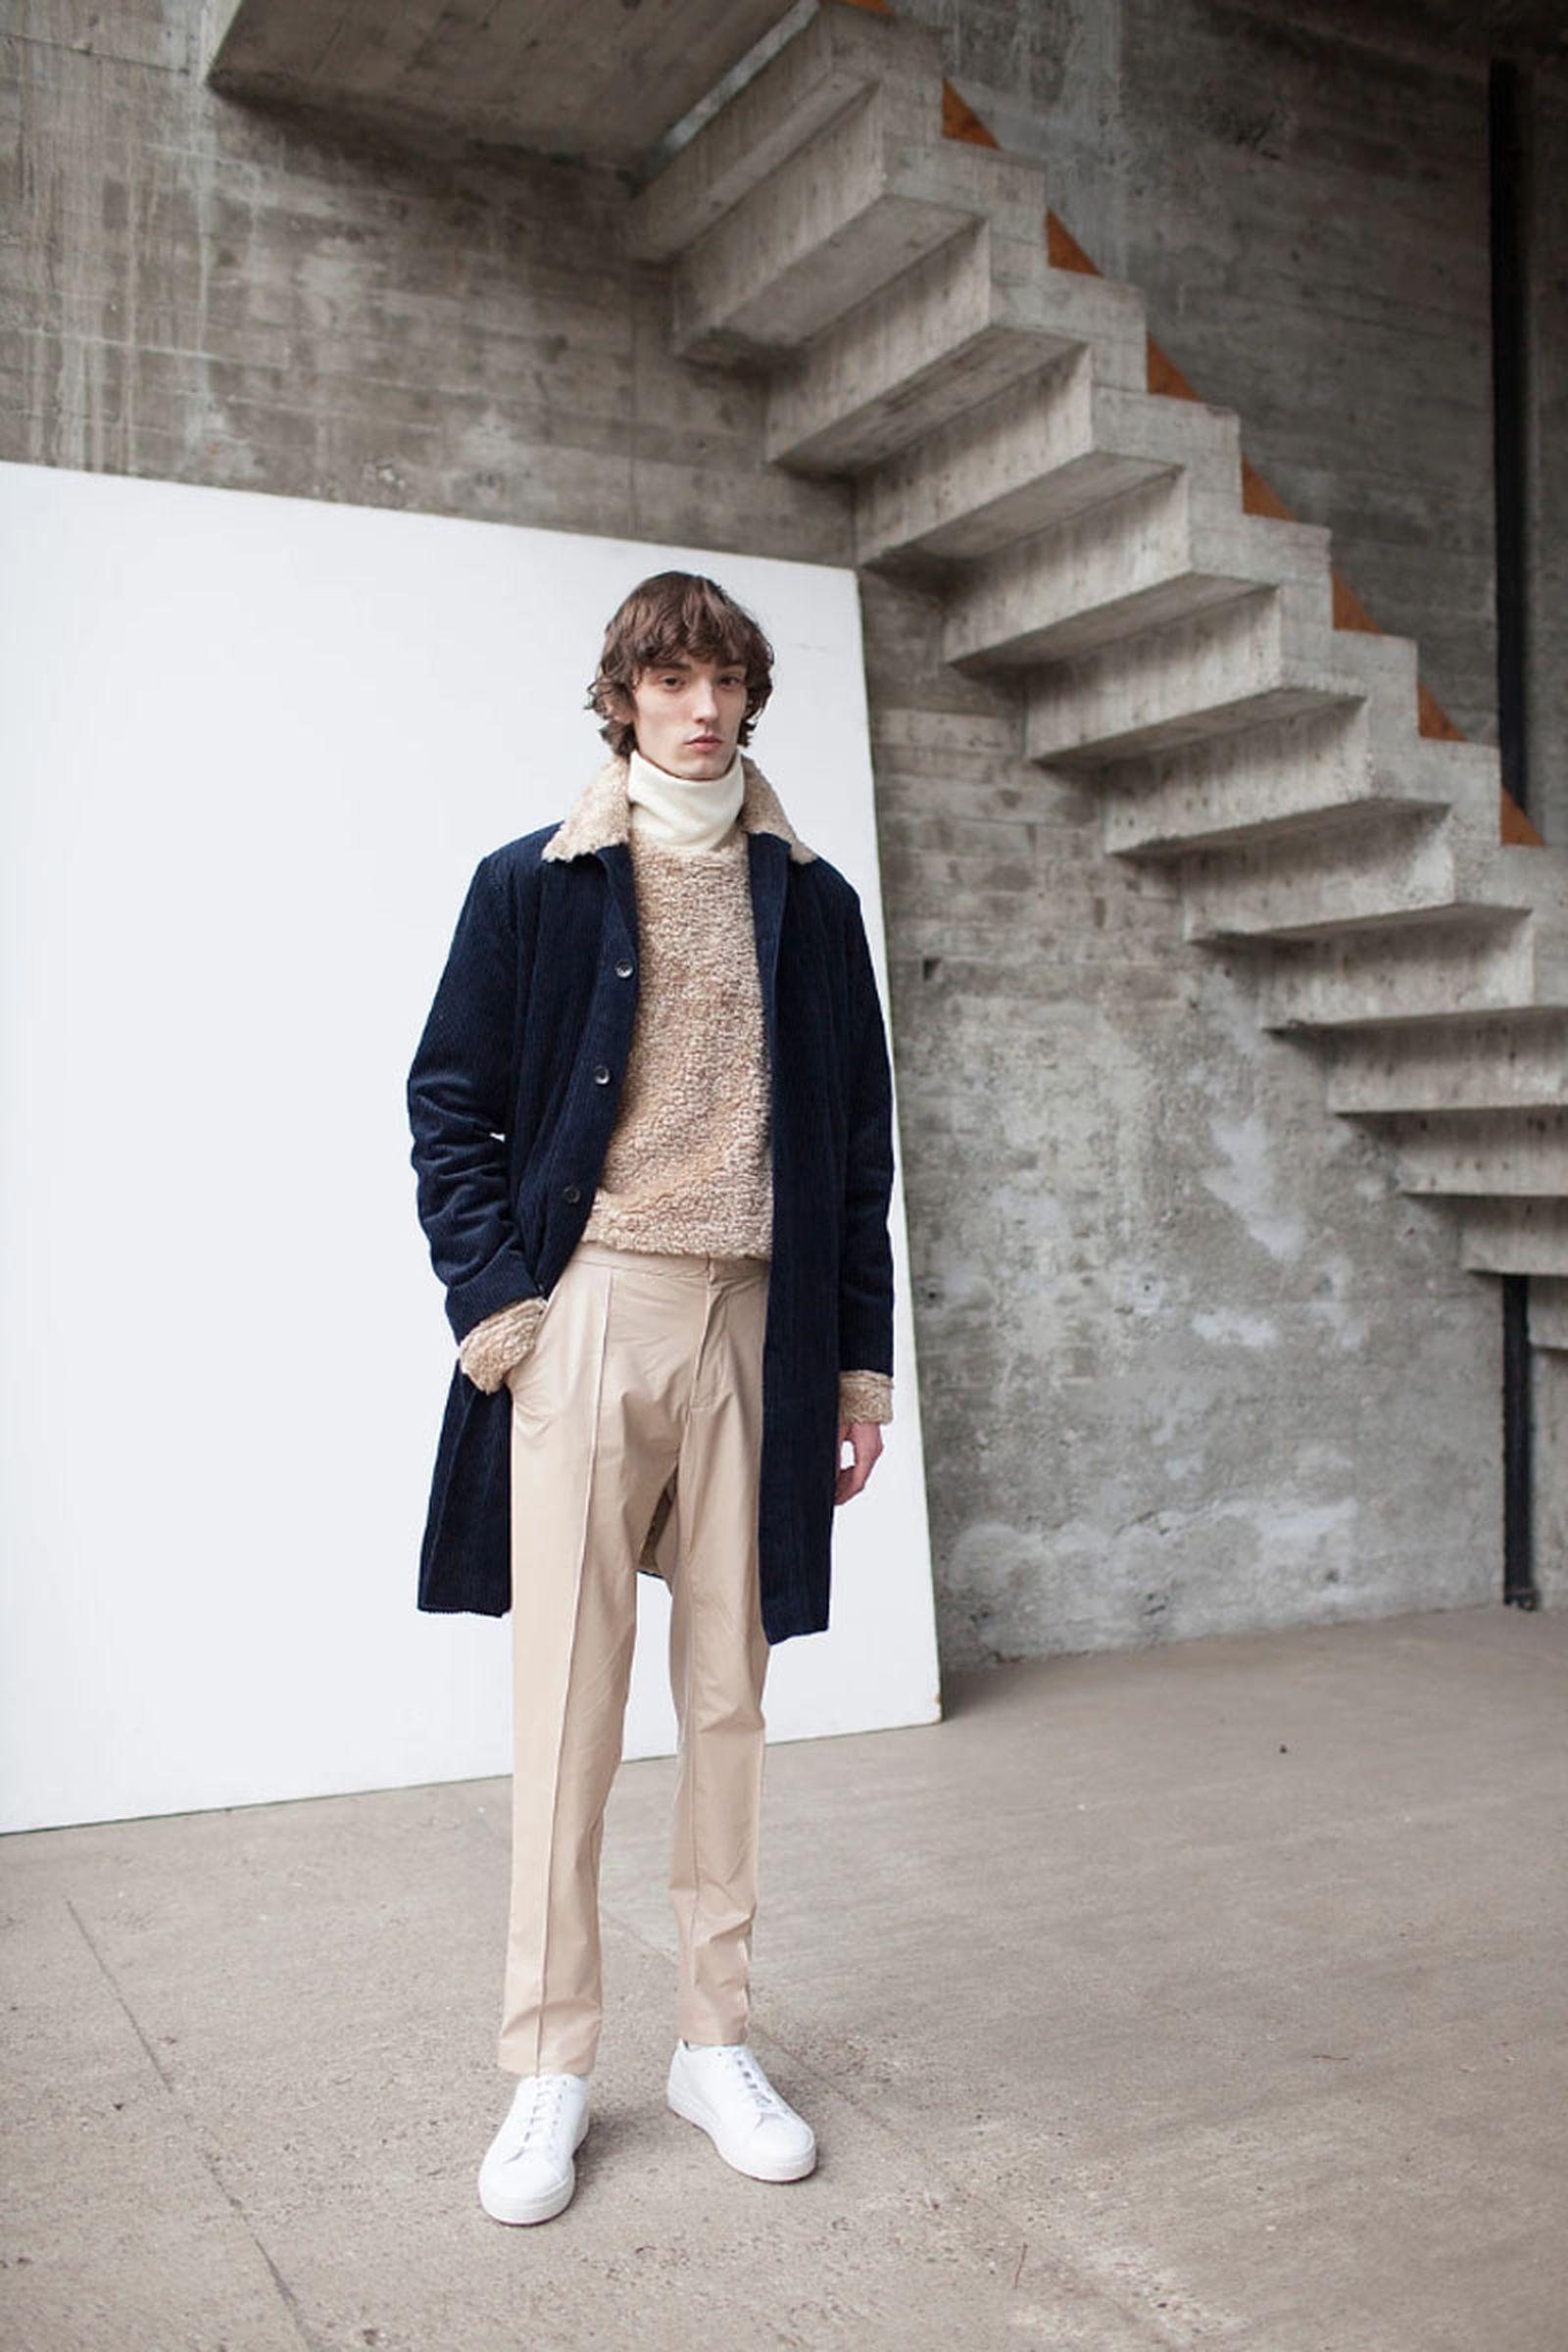 german clothing brands hien lee2 023c Adidas Boulezar